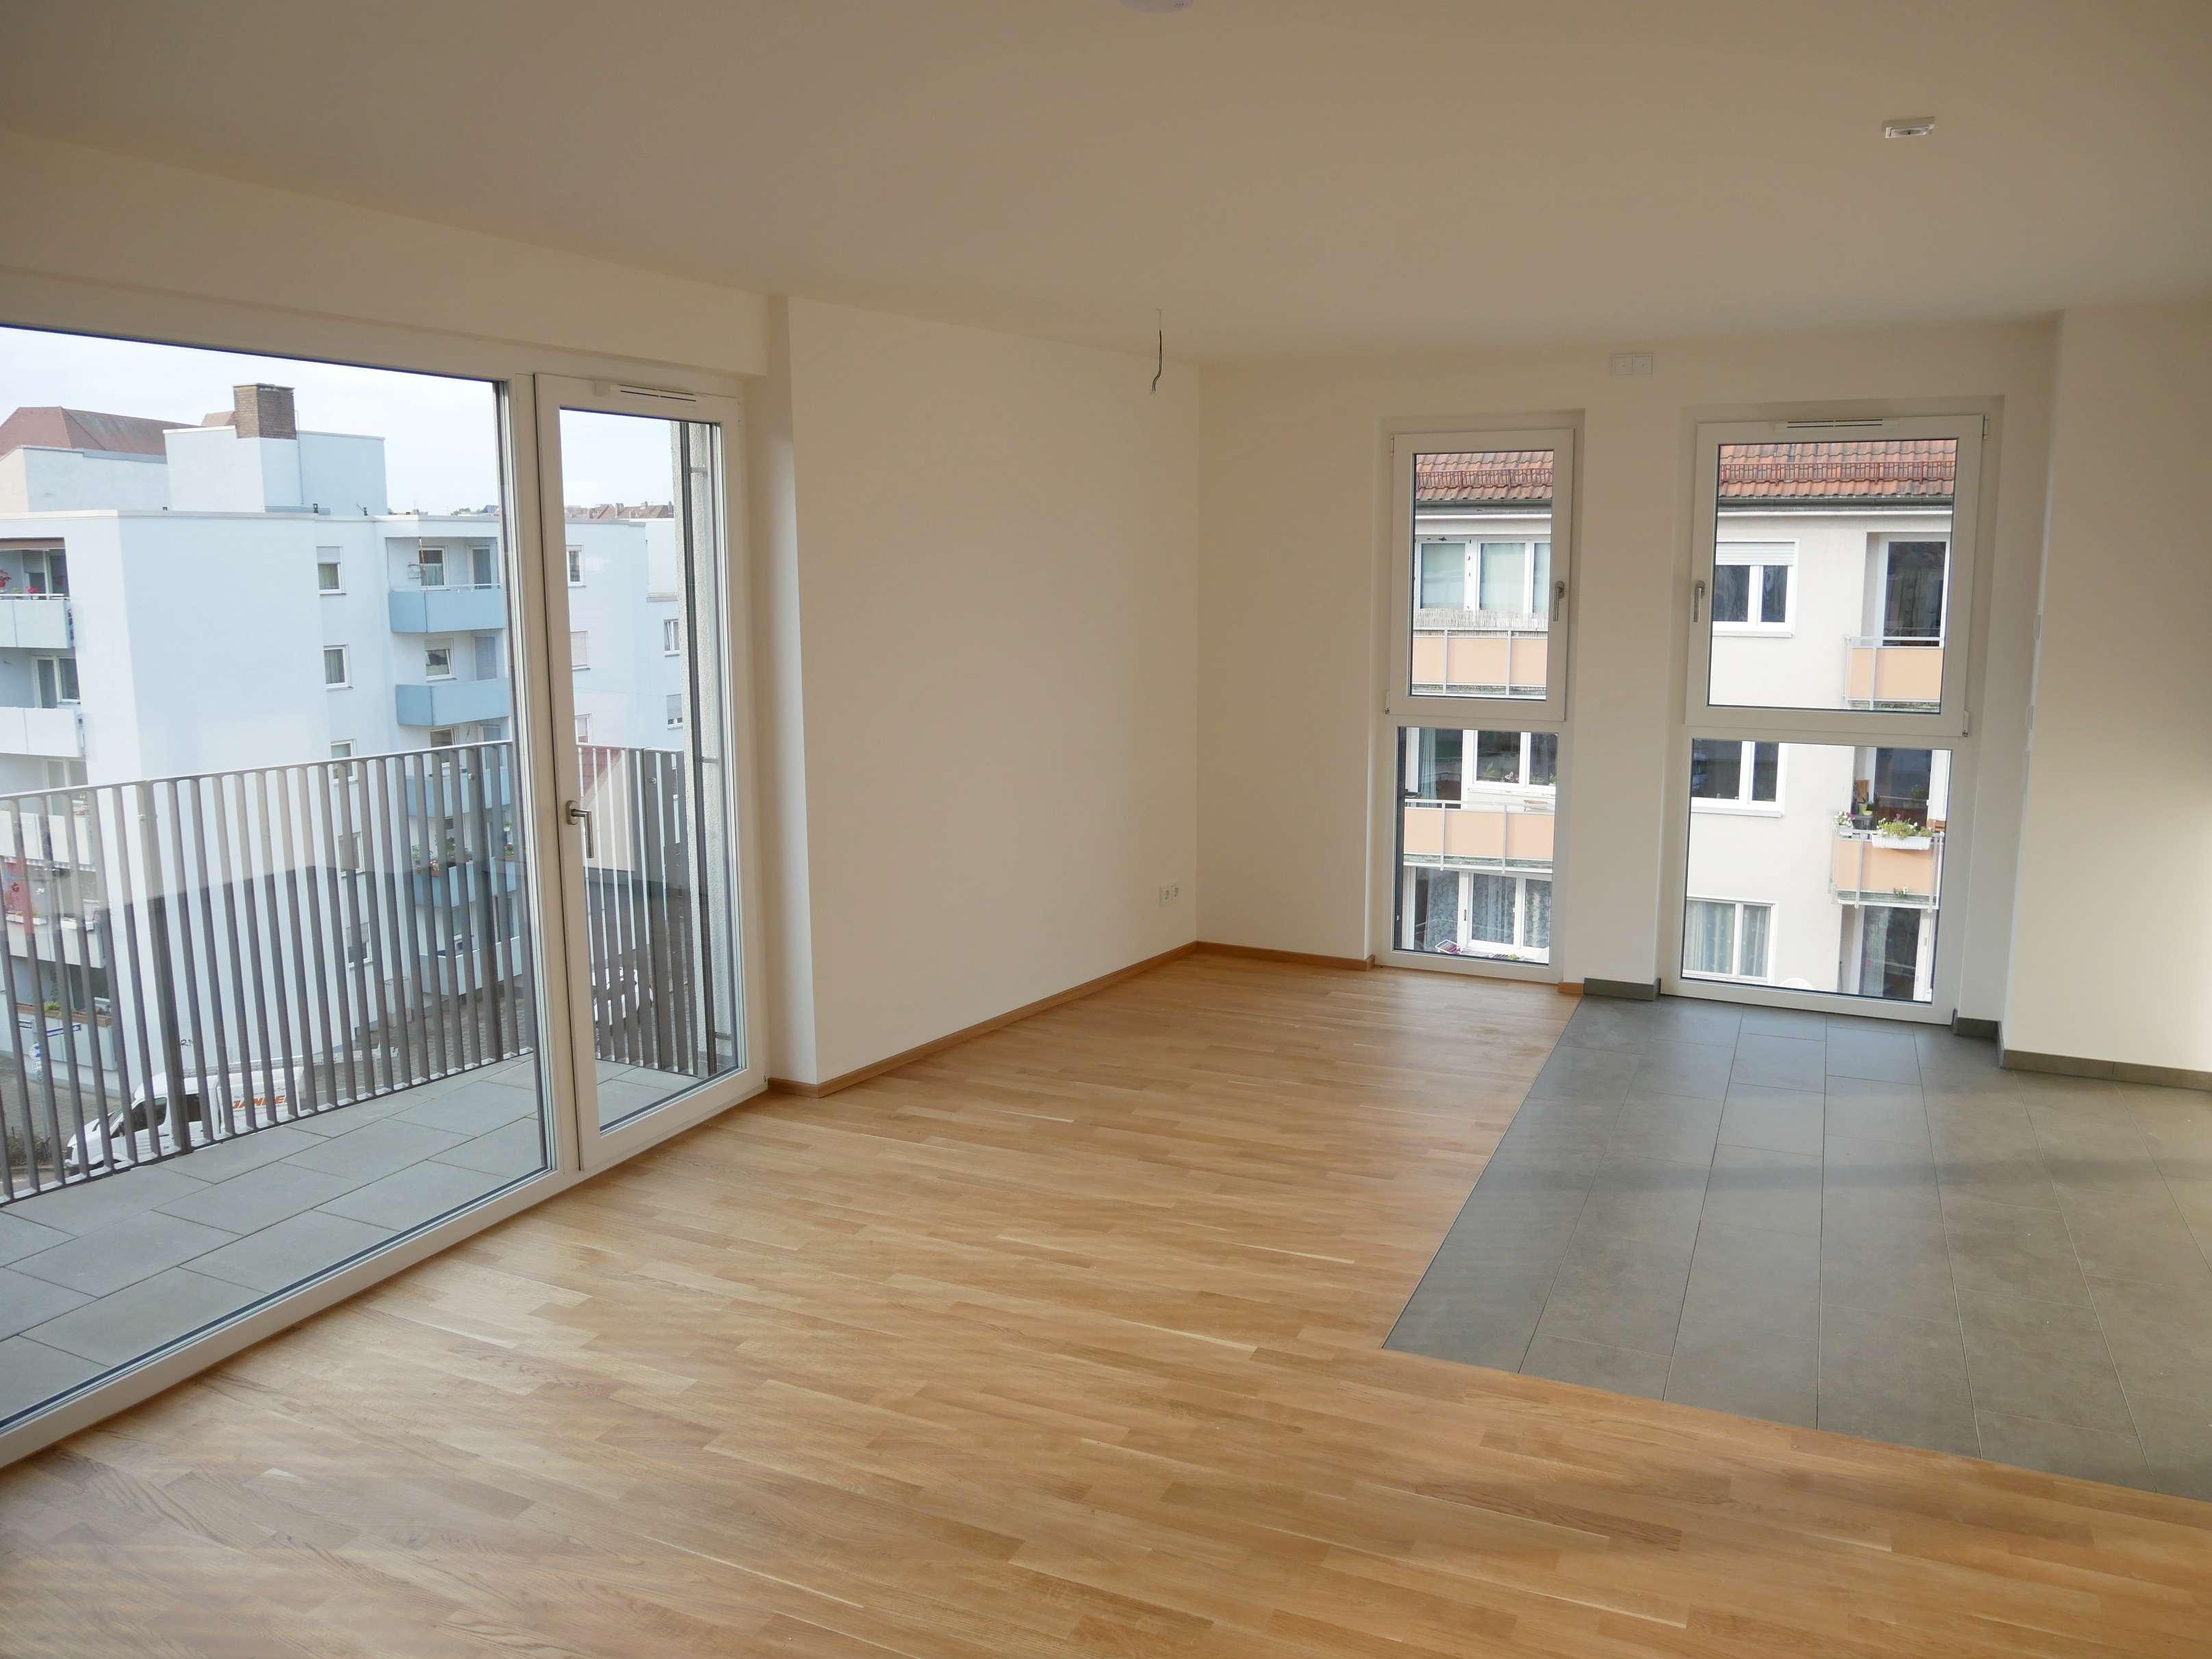 ERSTBEZUG! Exklusive, citynahe 3-Zimmer-Wohnung am Stadtpark (Lift, Balkon, TG, …) in Pirckheimerstraße (Nürnberg)